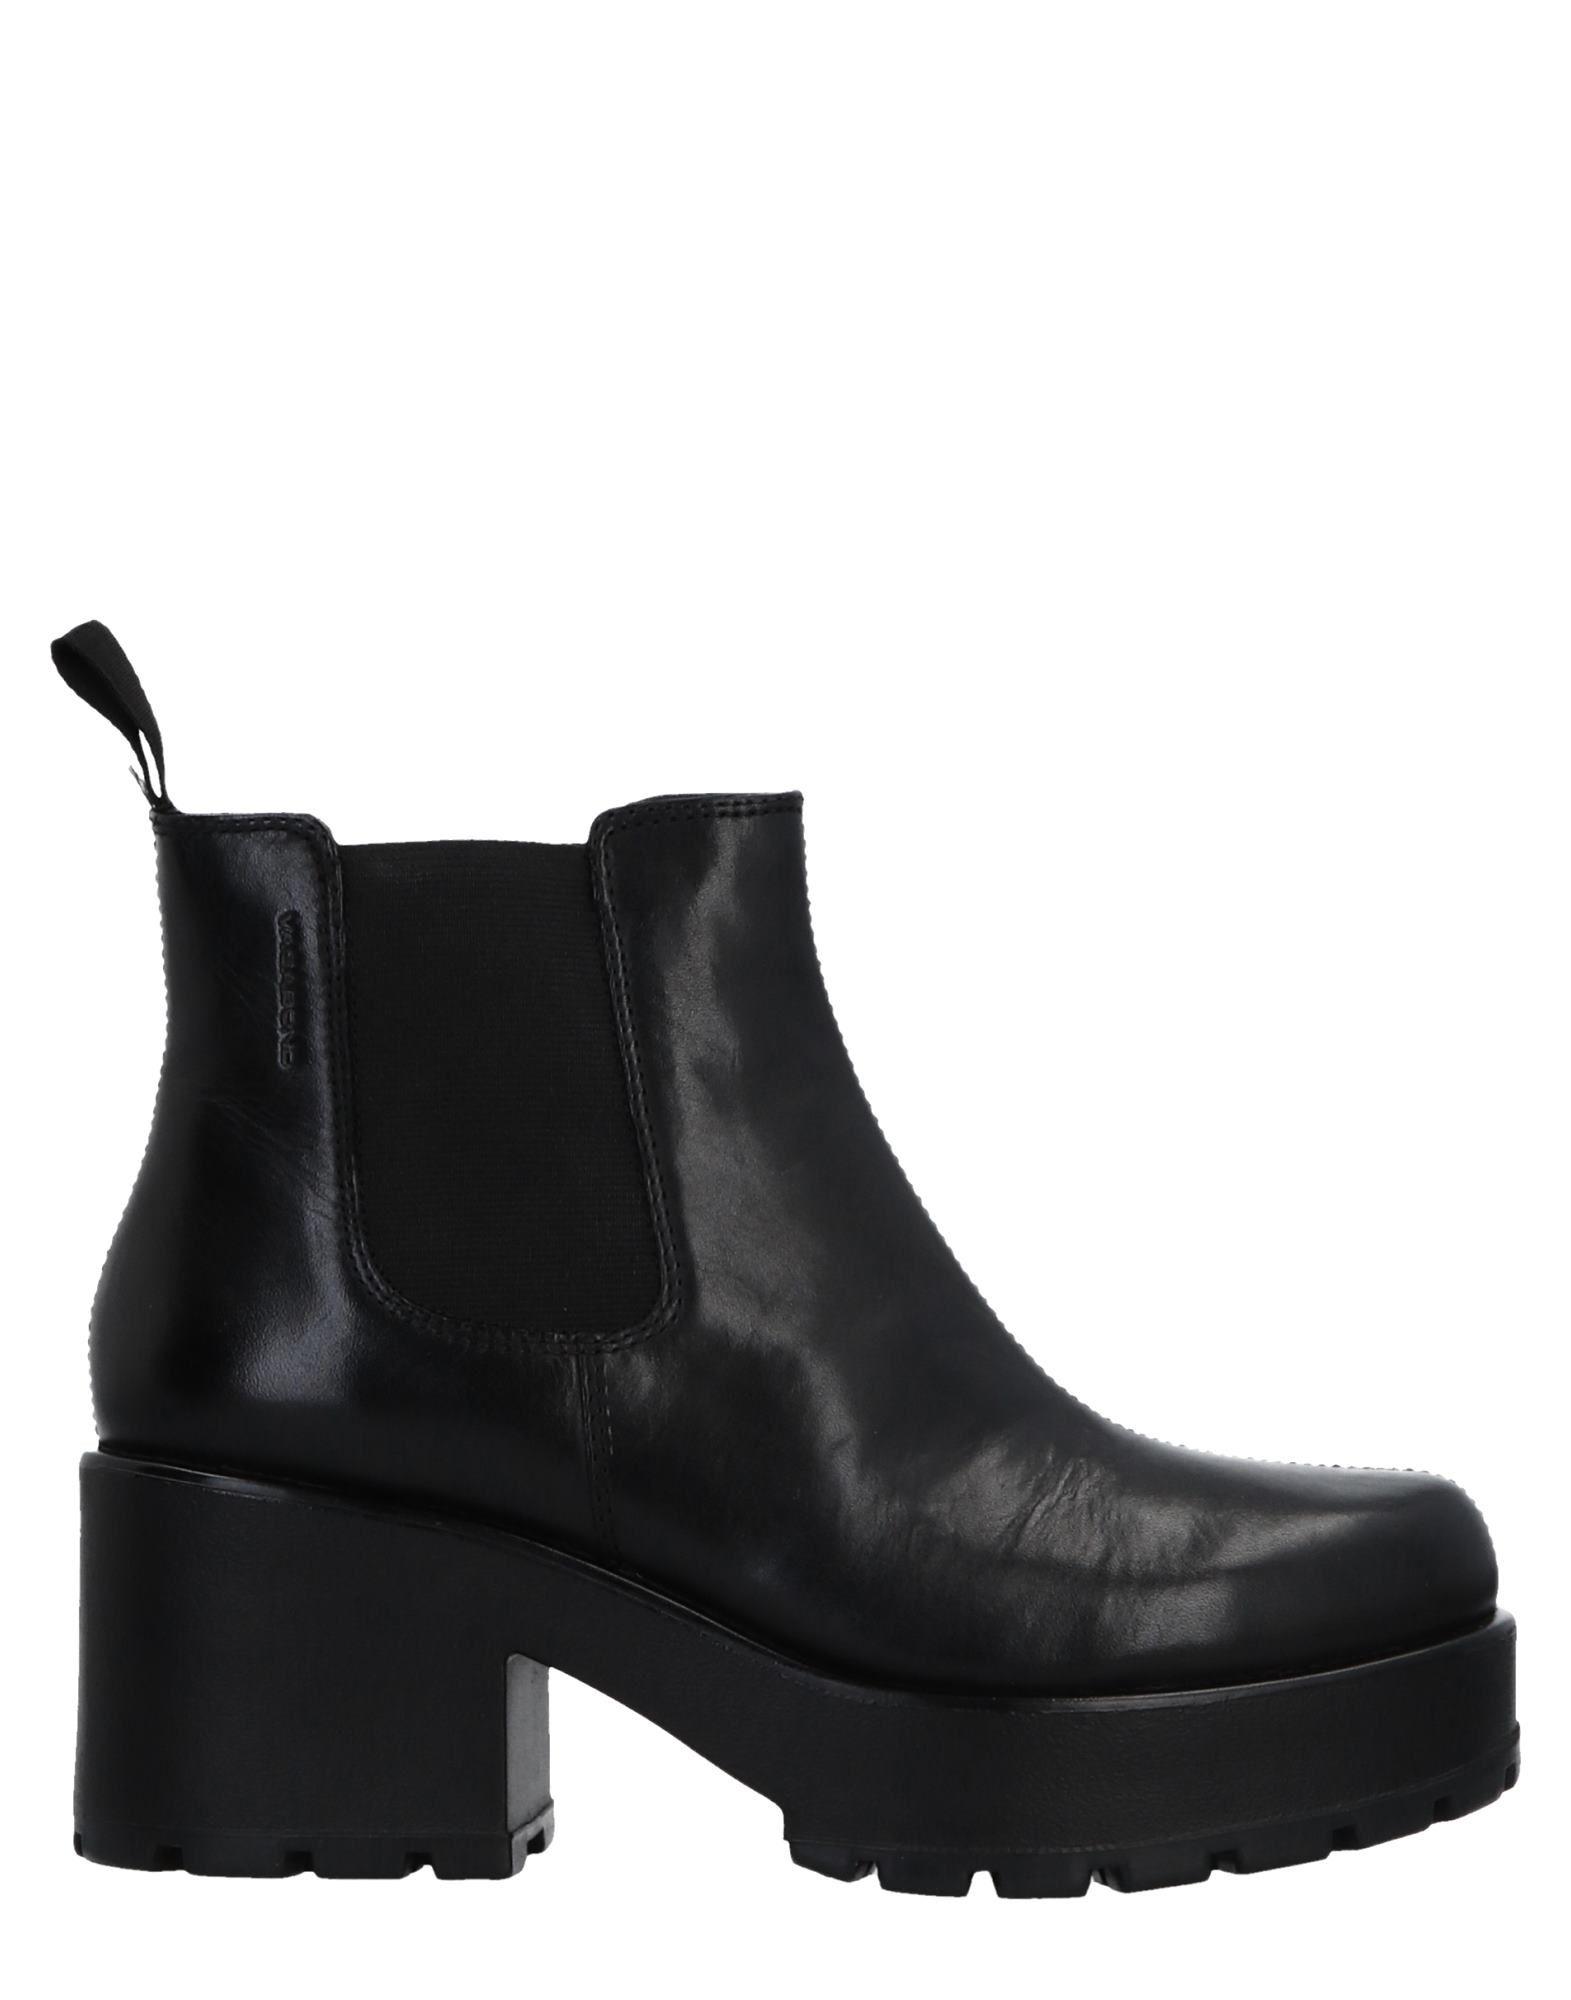 Stilvolle billige Schuhe Vagabond Shoemakers Stiefelette Damen  11513234FN 11513234FN 11513234FN aa9b74